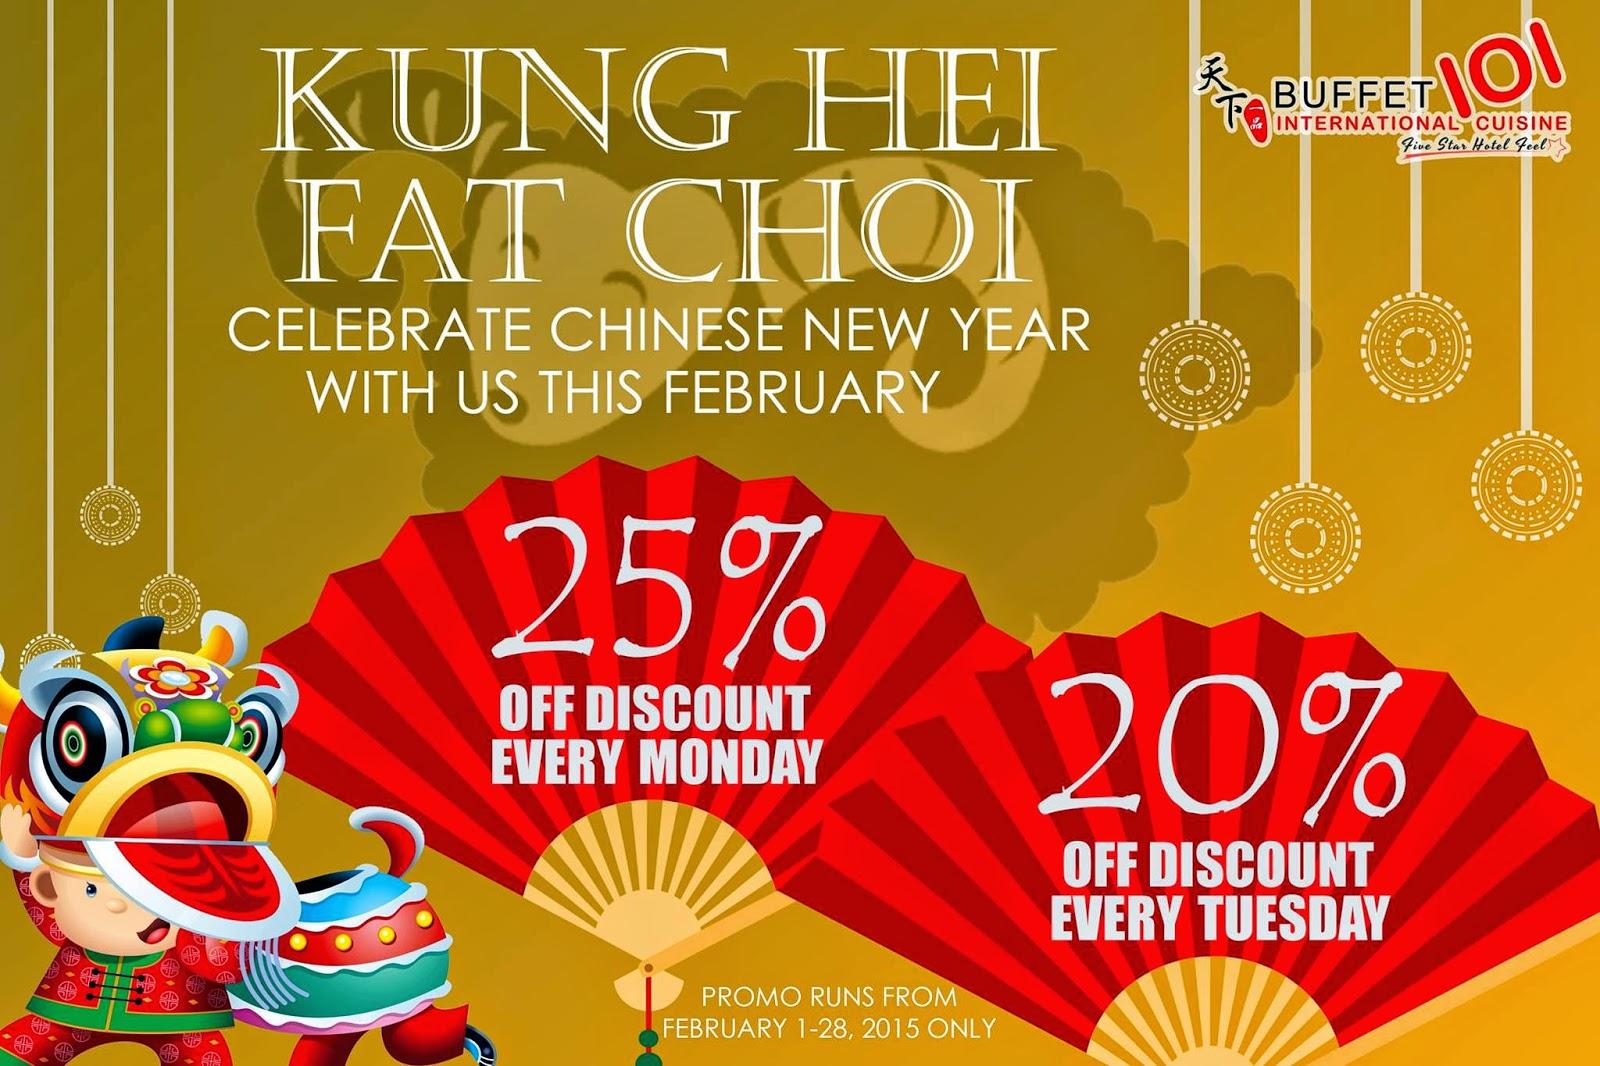 Buffet 101 Chinese New Year Promo